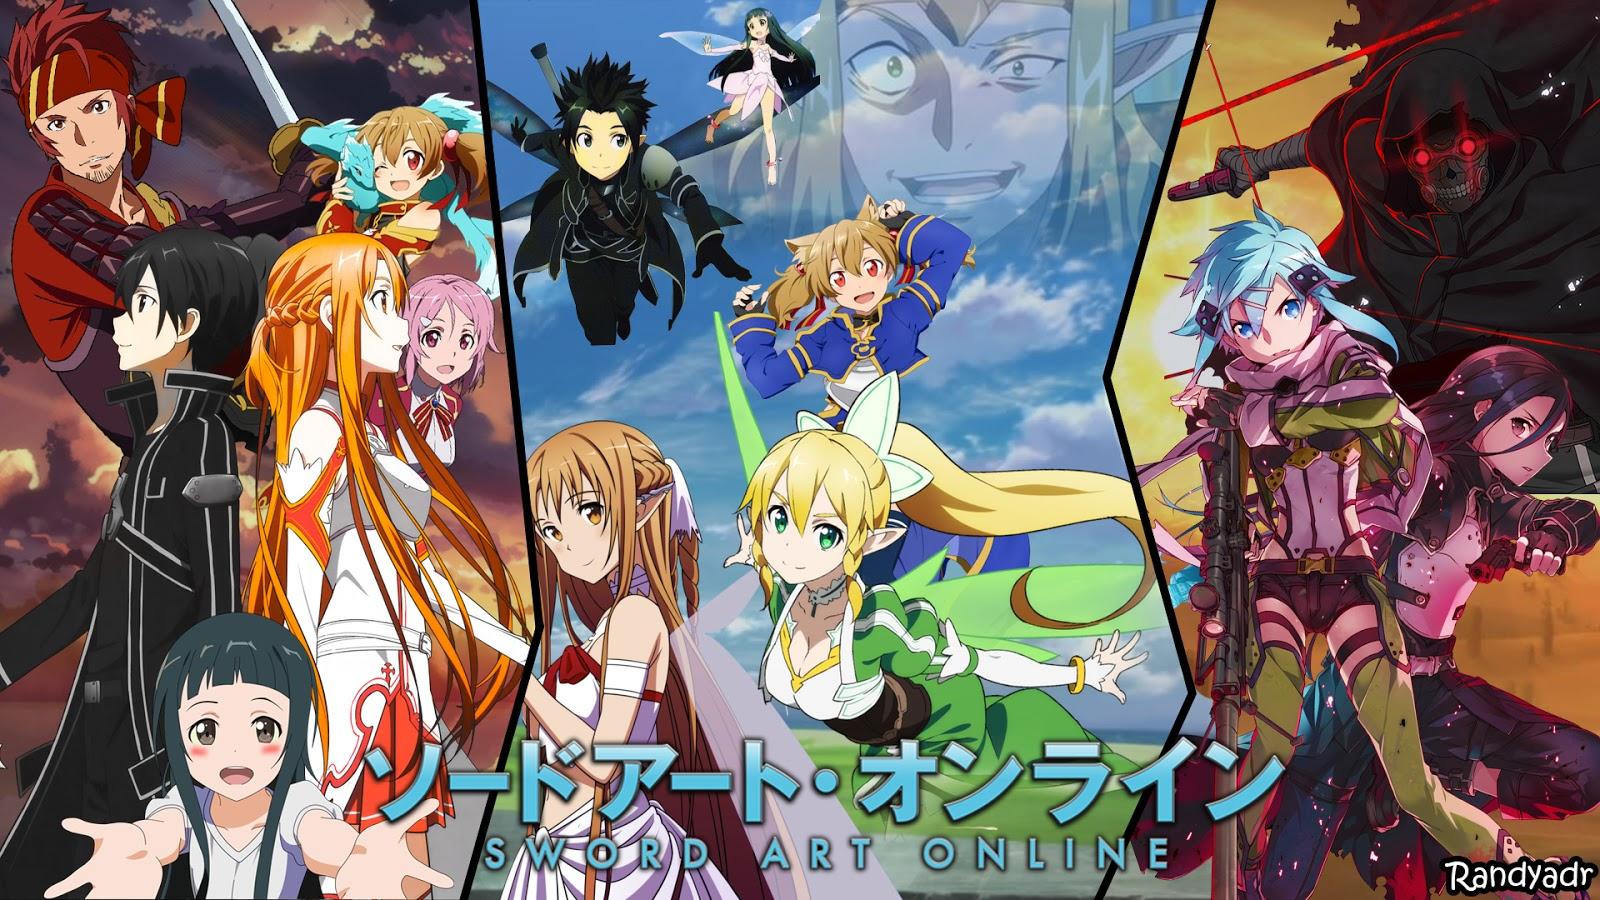 ... - As Sword Art Online Season 2 Awaits Release Date Videos Explore